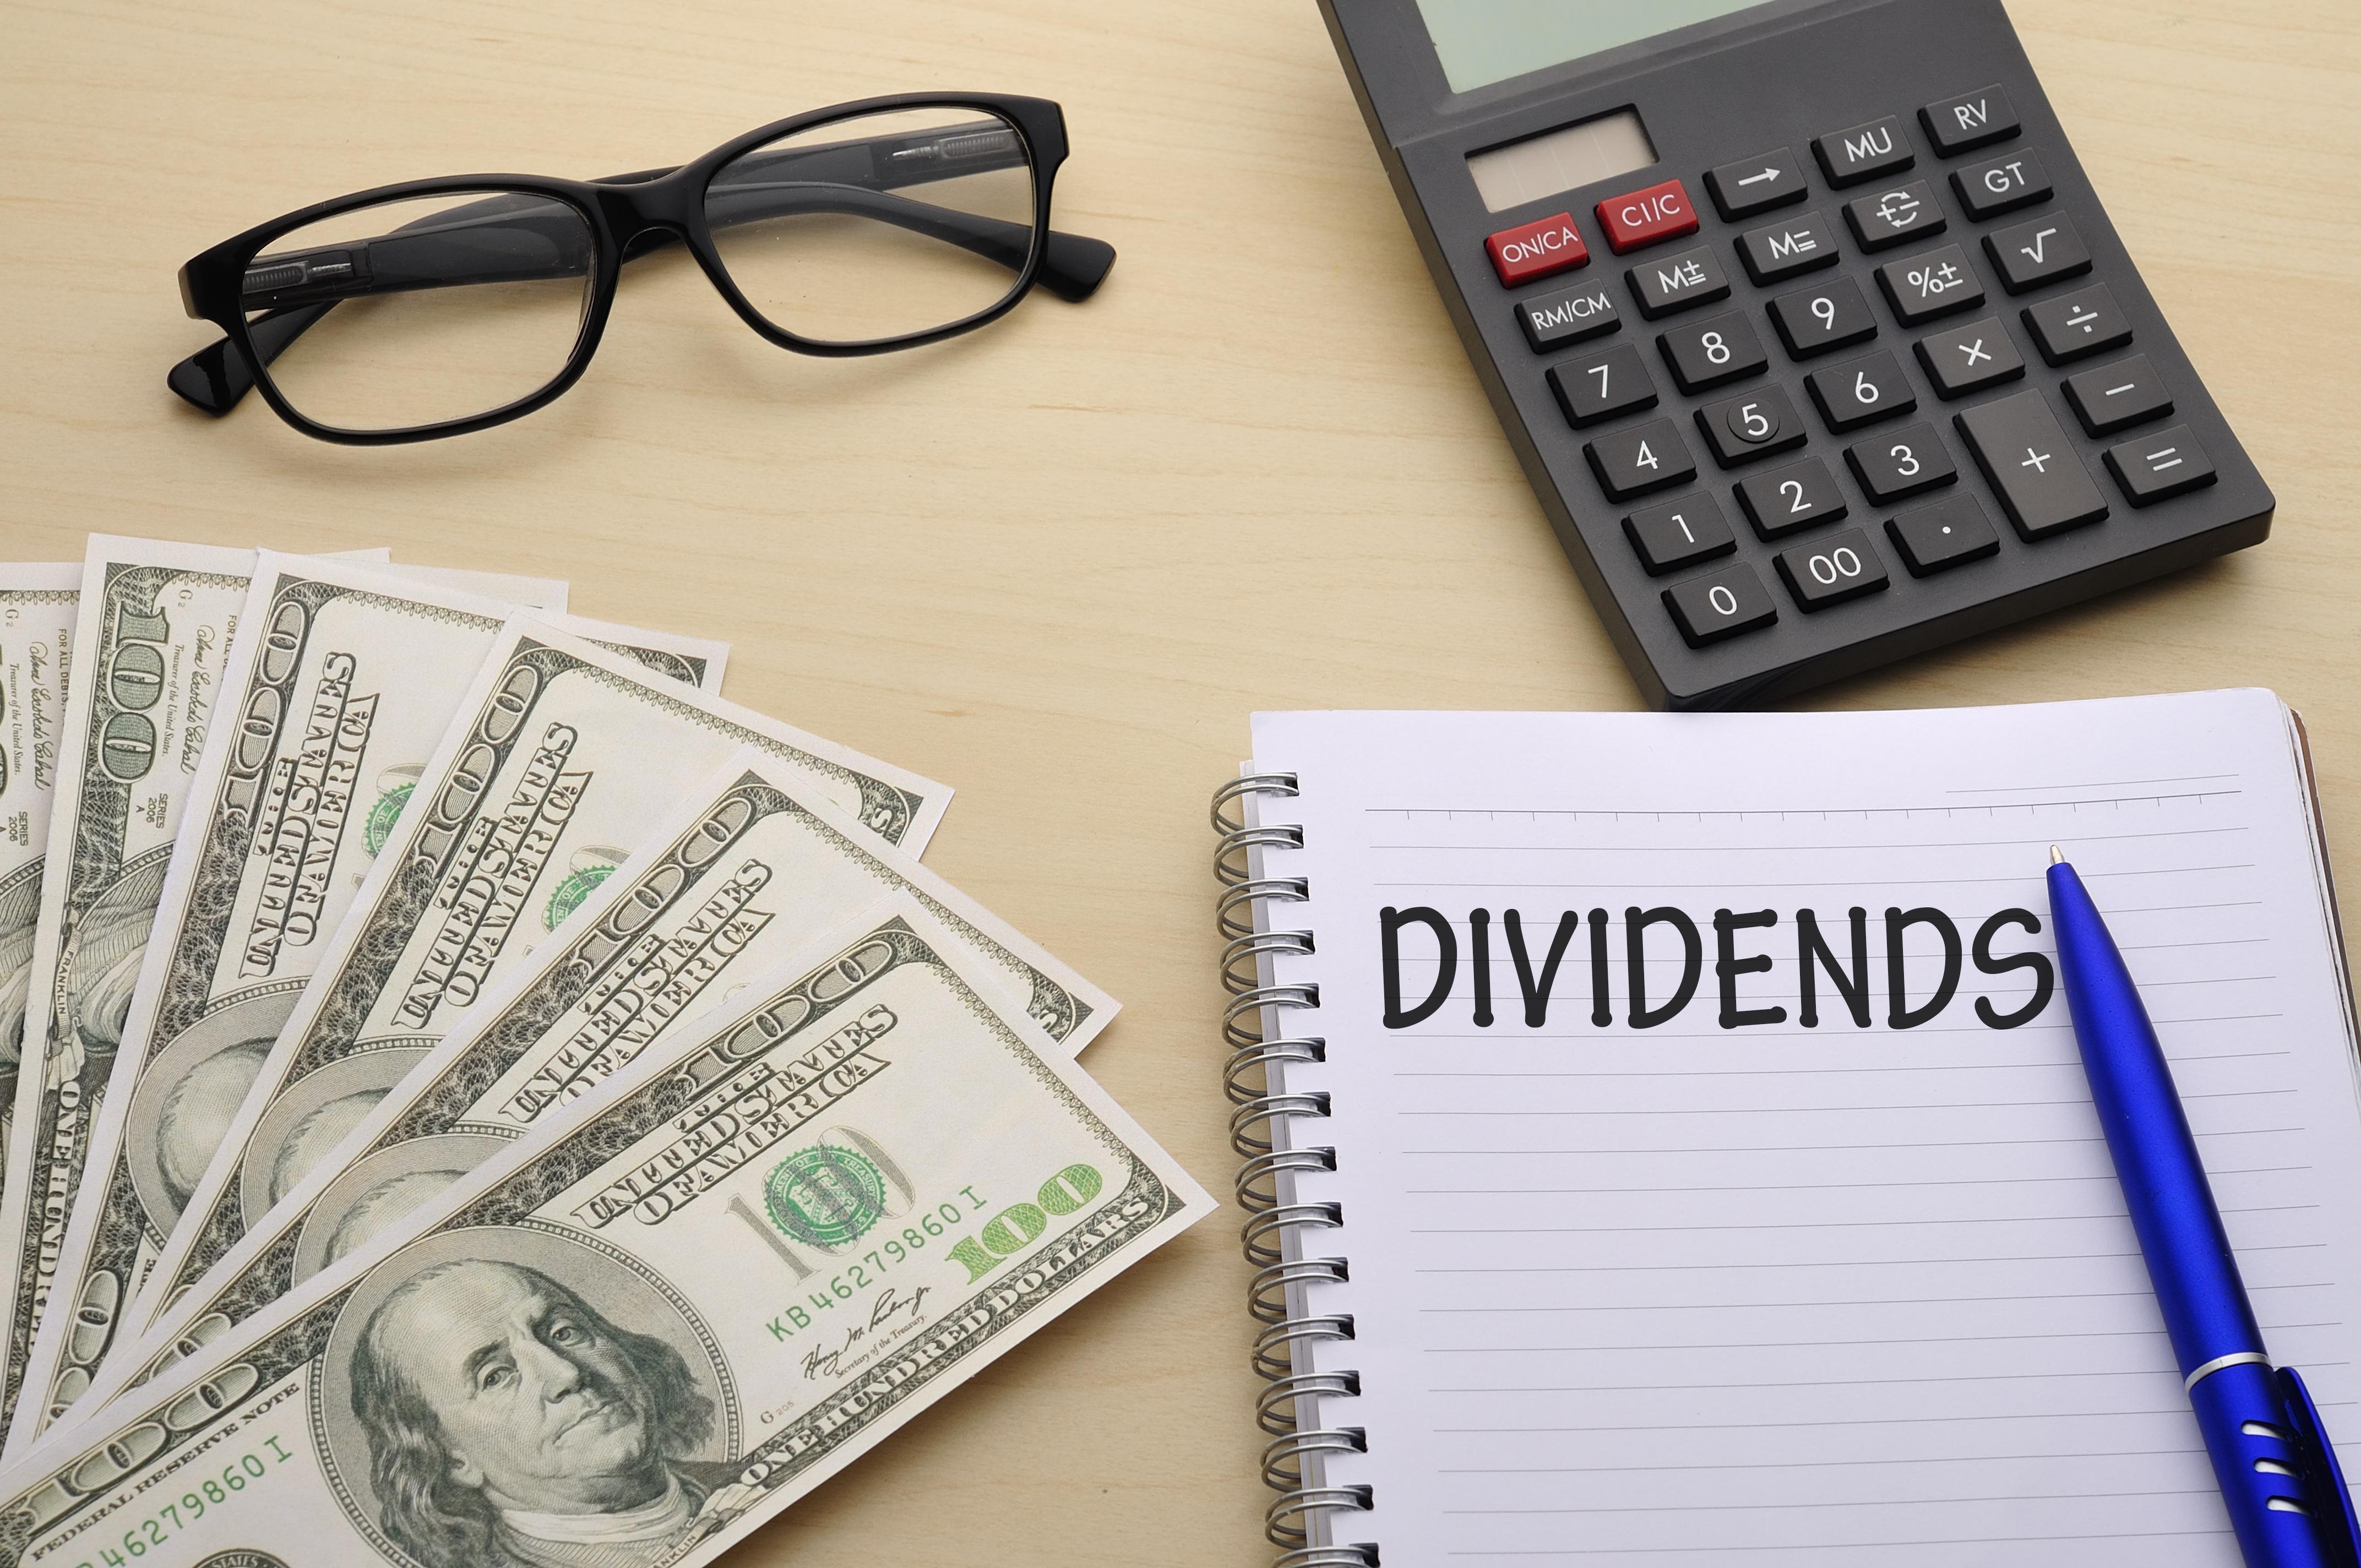 Planning for dividends